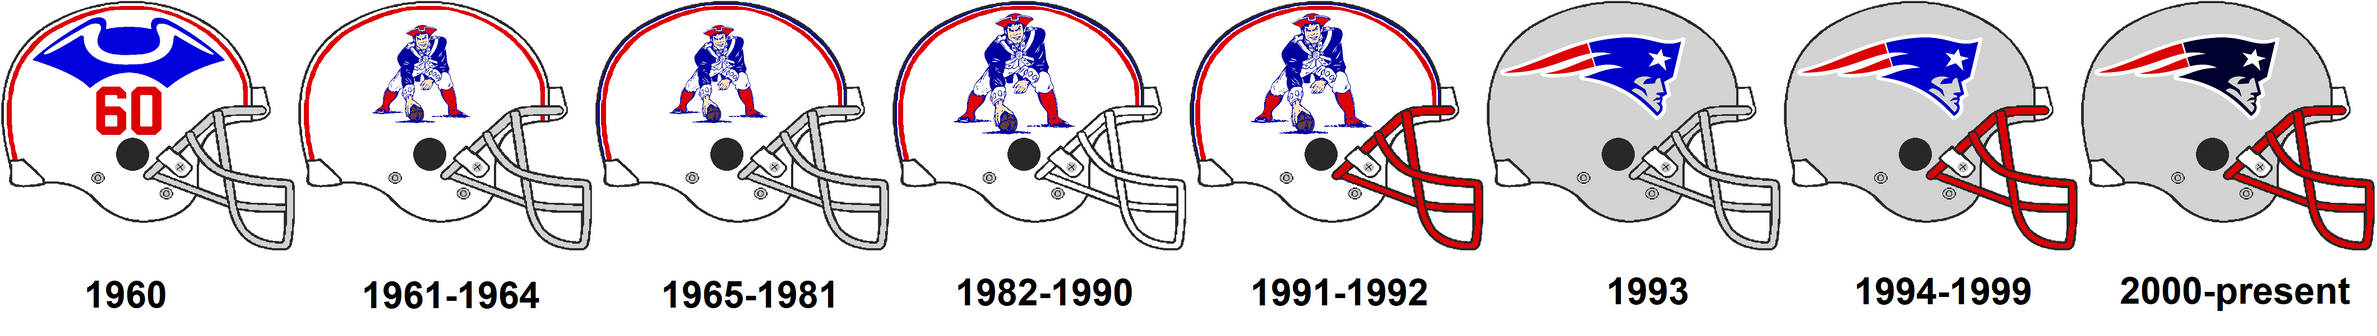 History of the New England Patriots Helmets